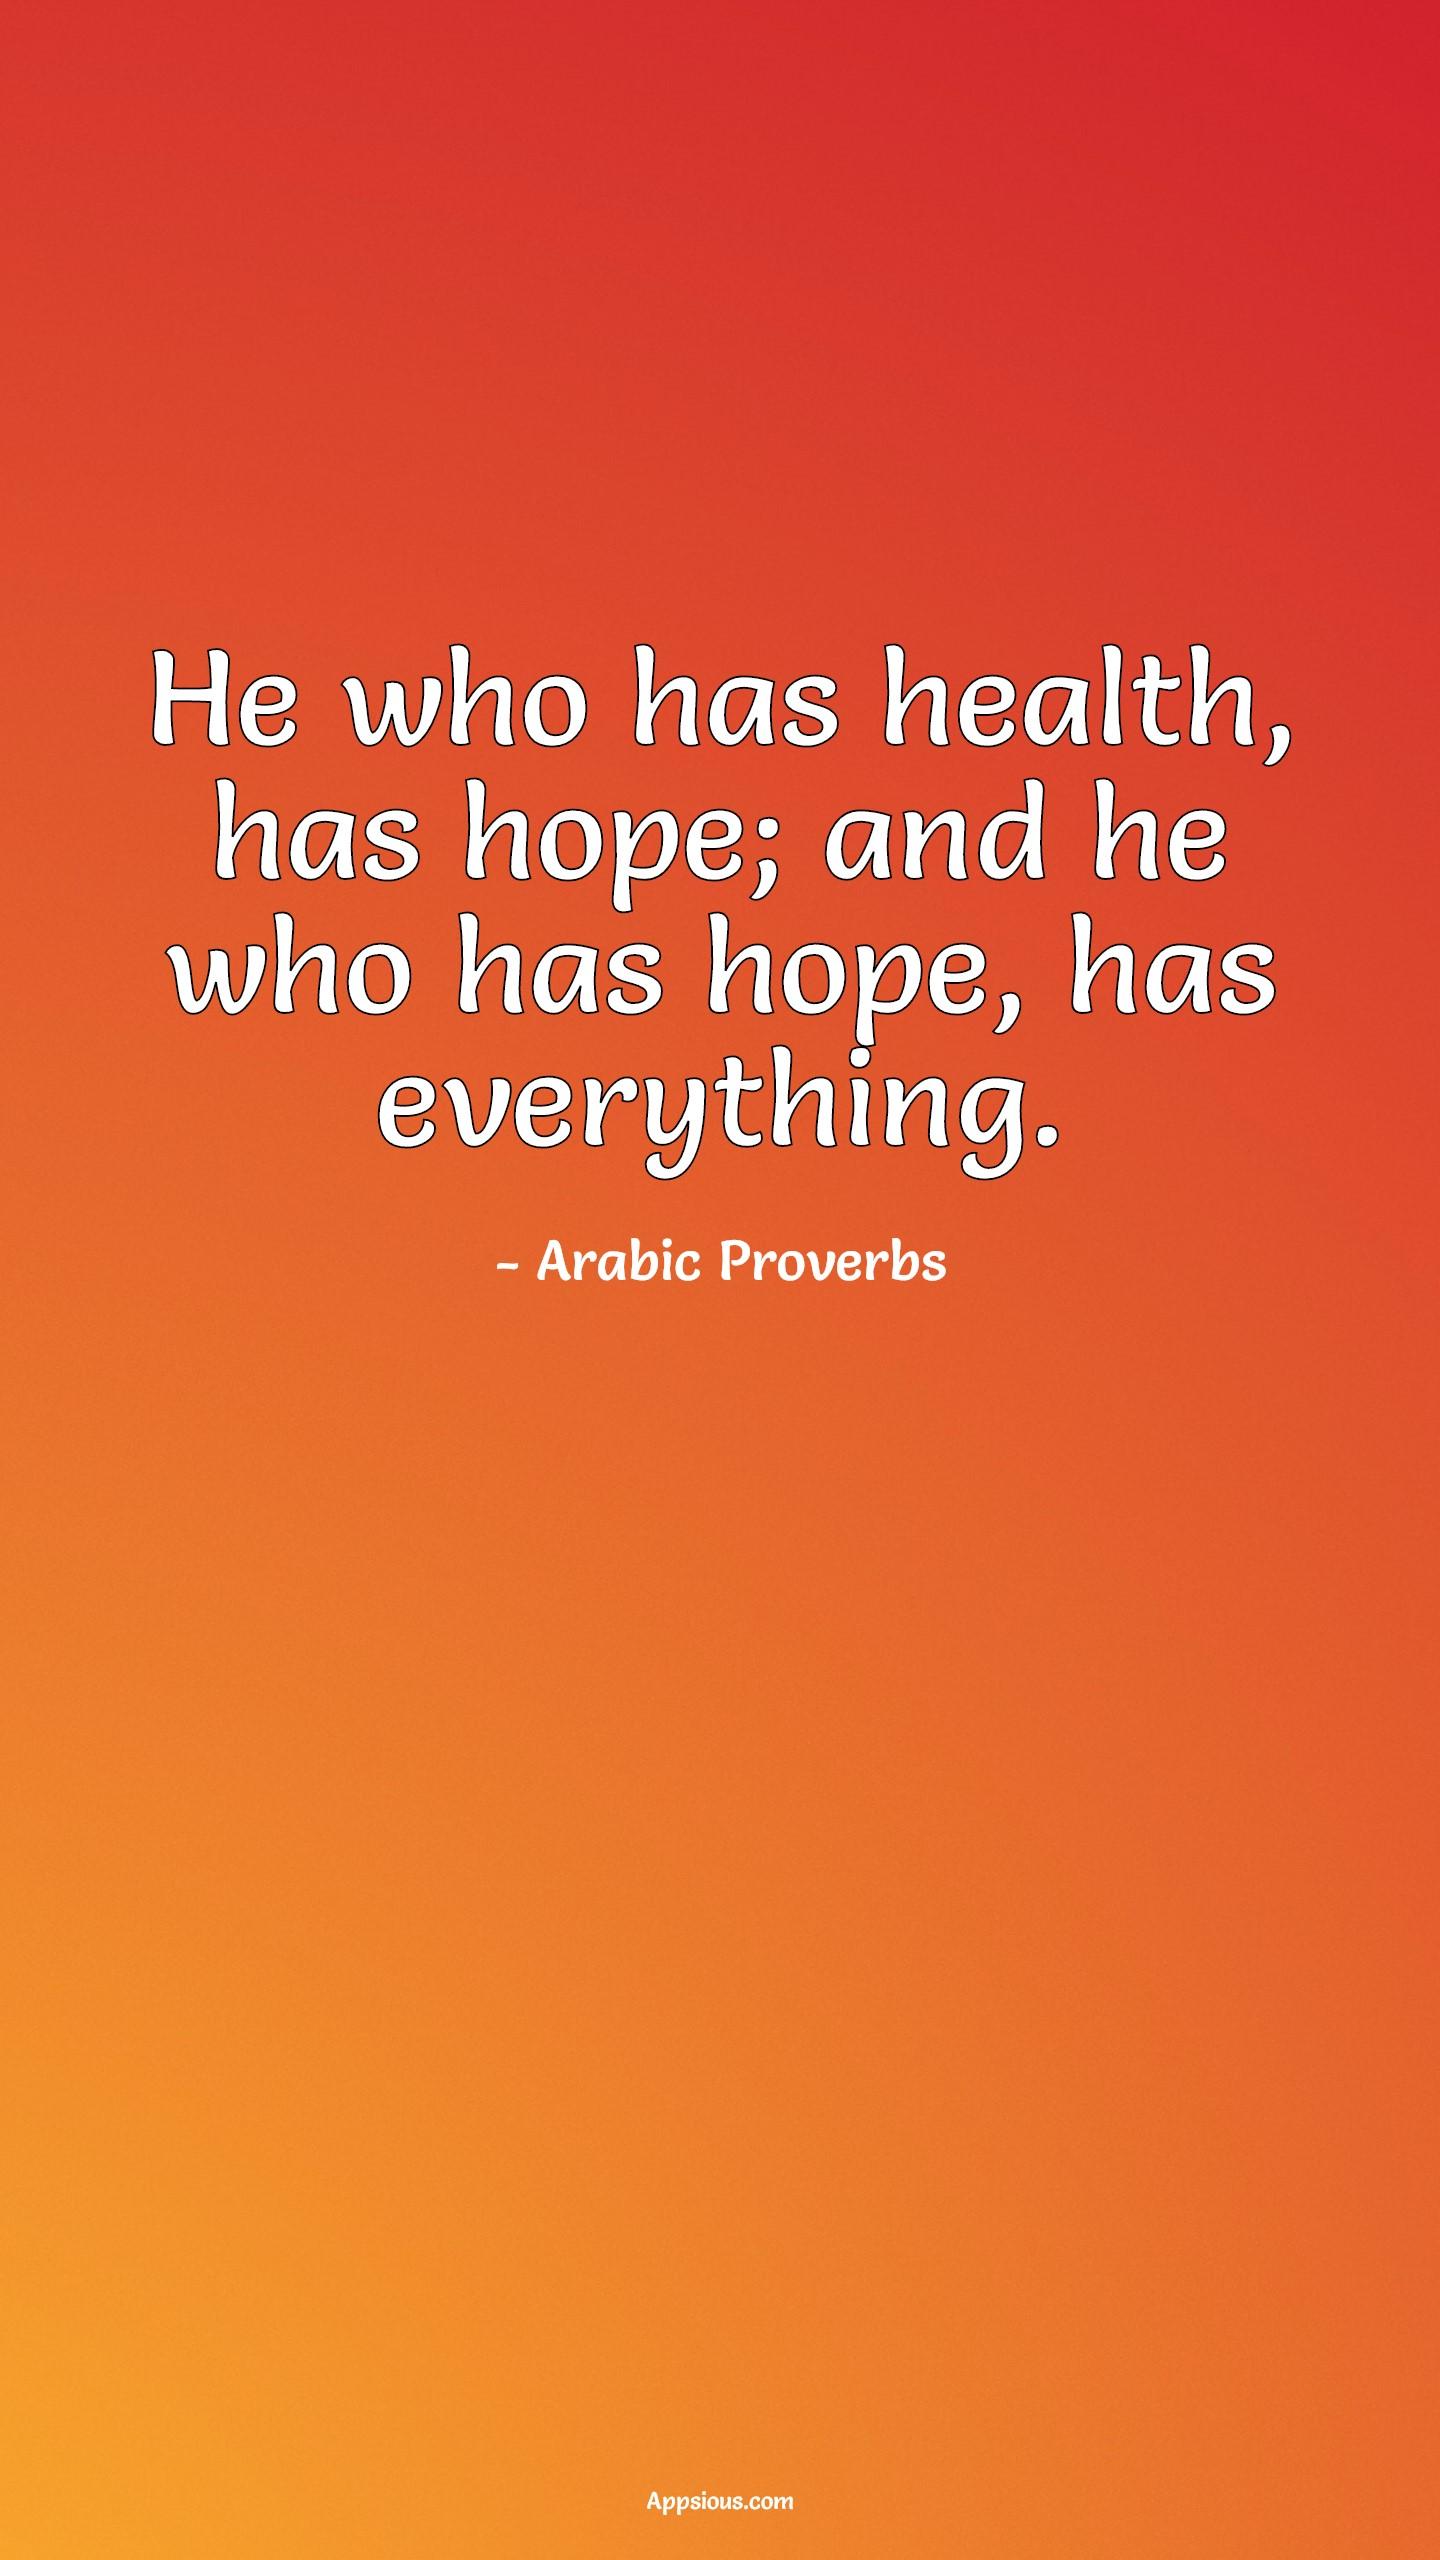 He who has health has hope, And he who has hope has everything.